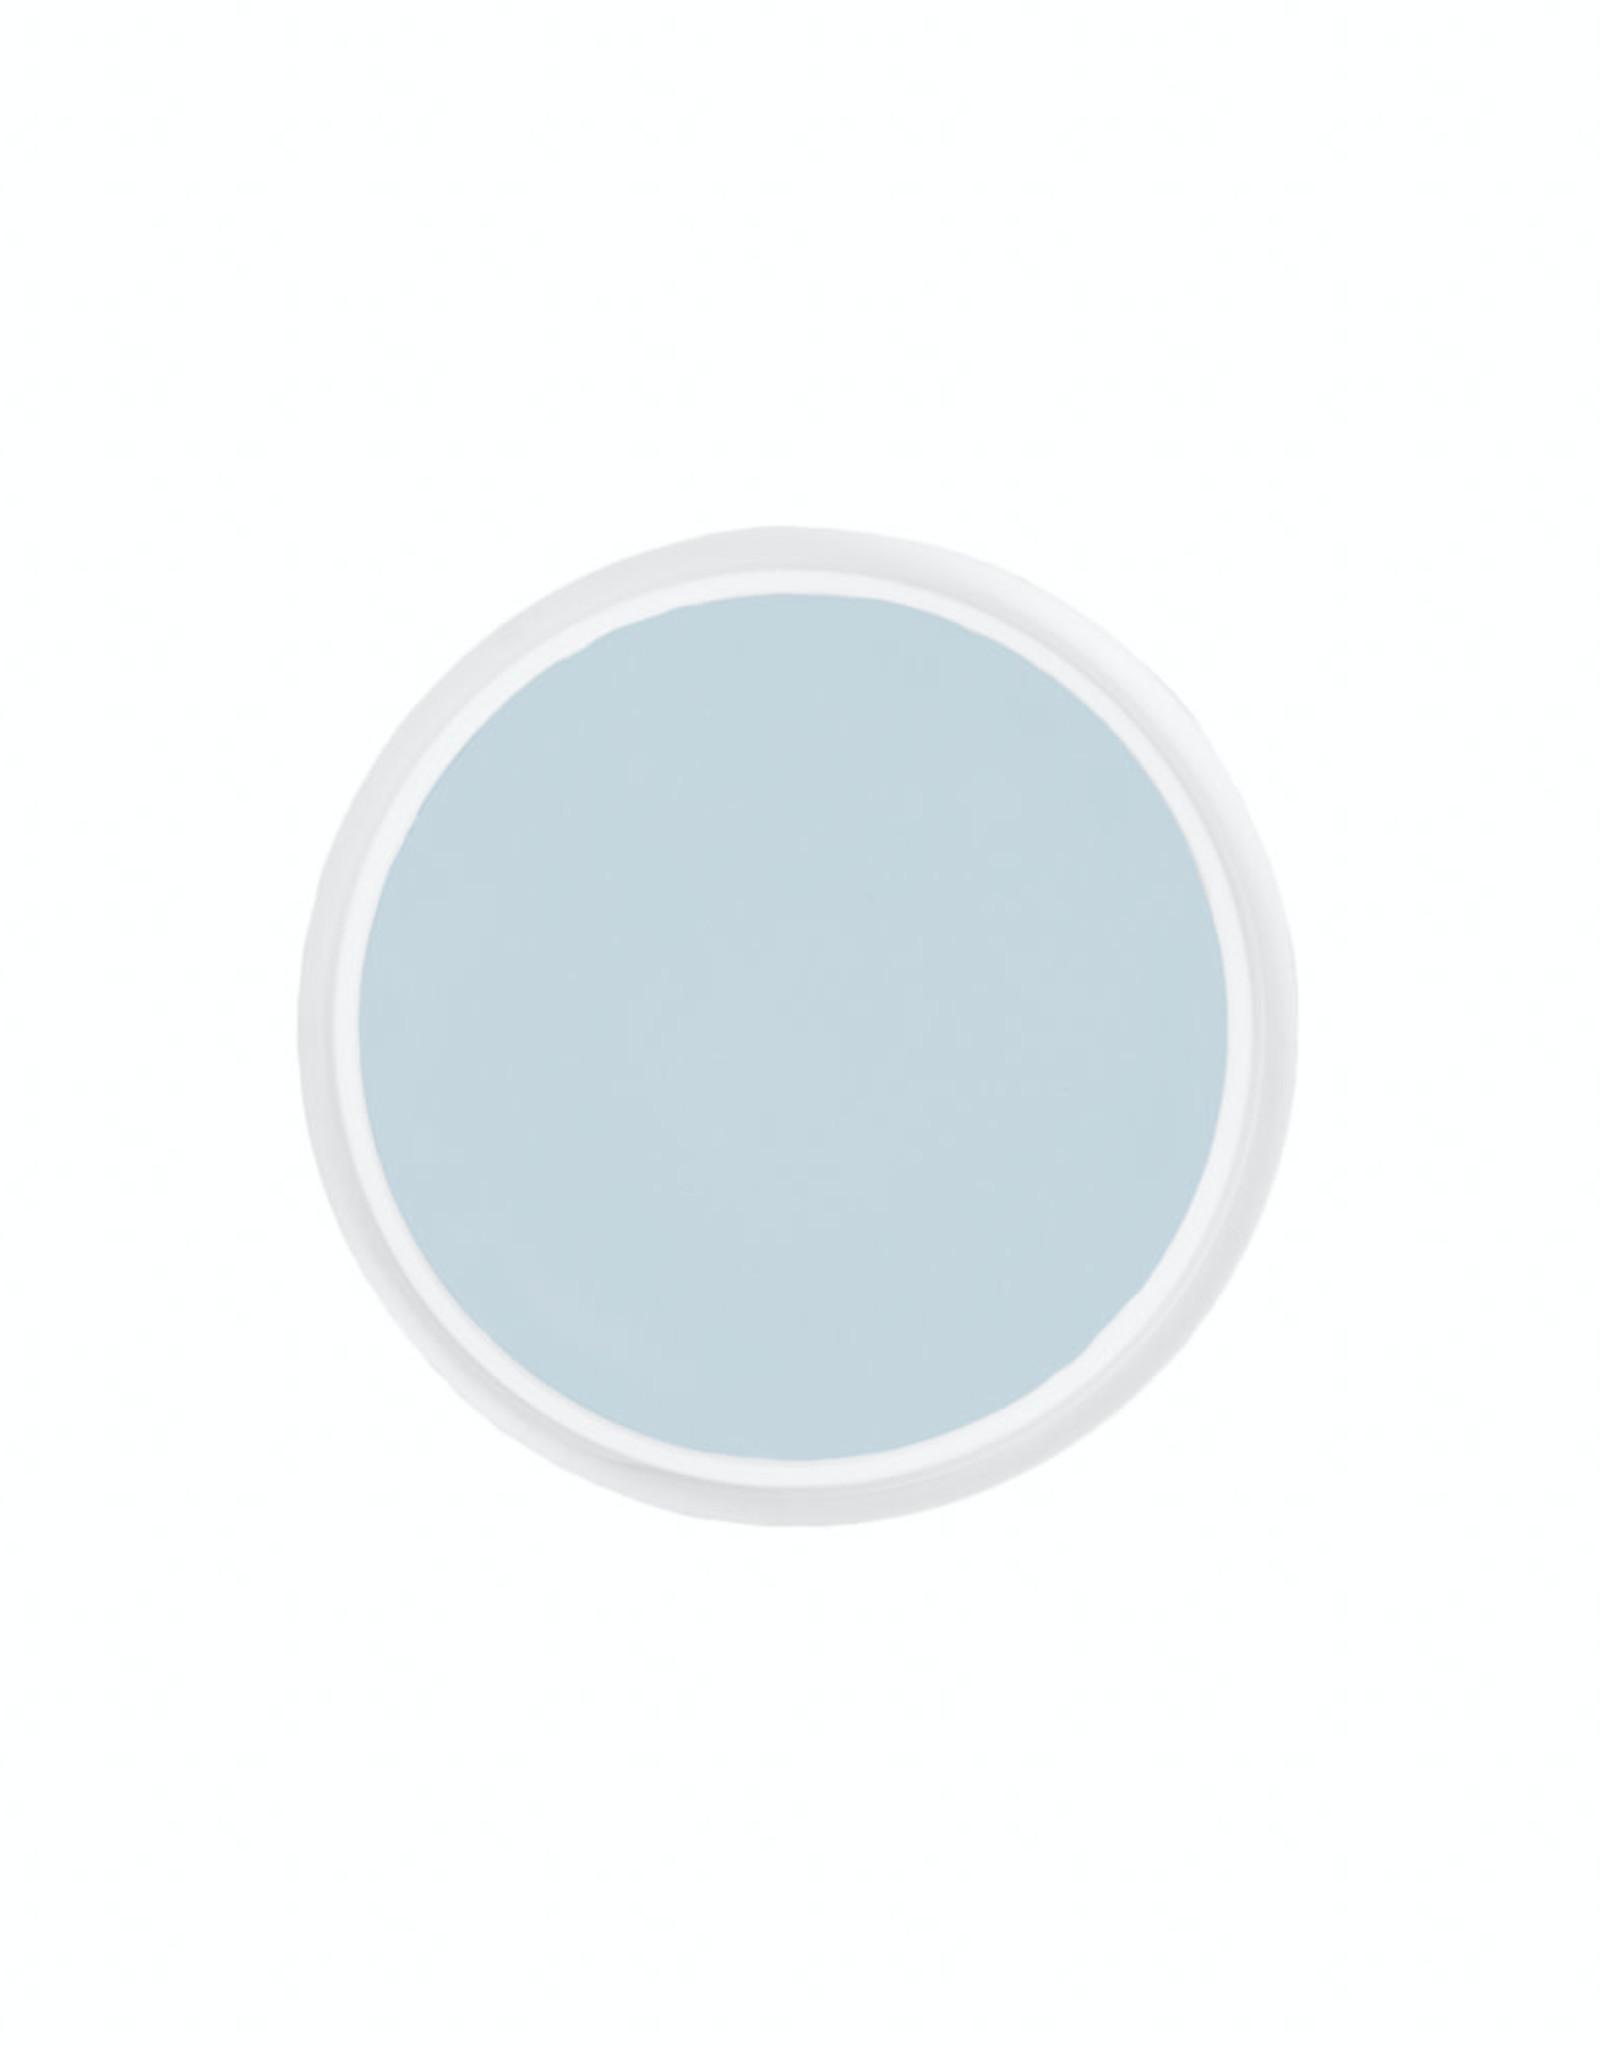 Ben Nye FX CREME FNDTN, BLUE SPIRIT, .5 OZ